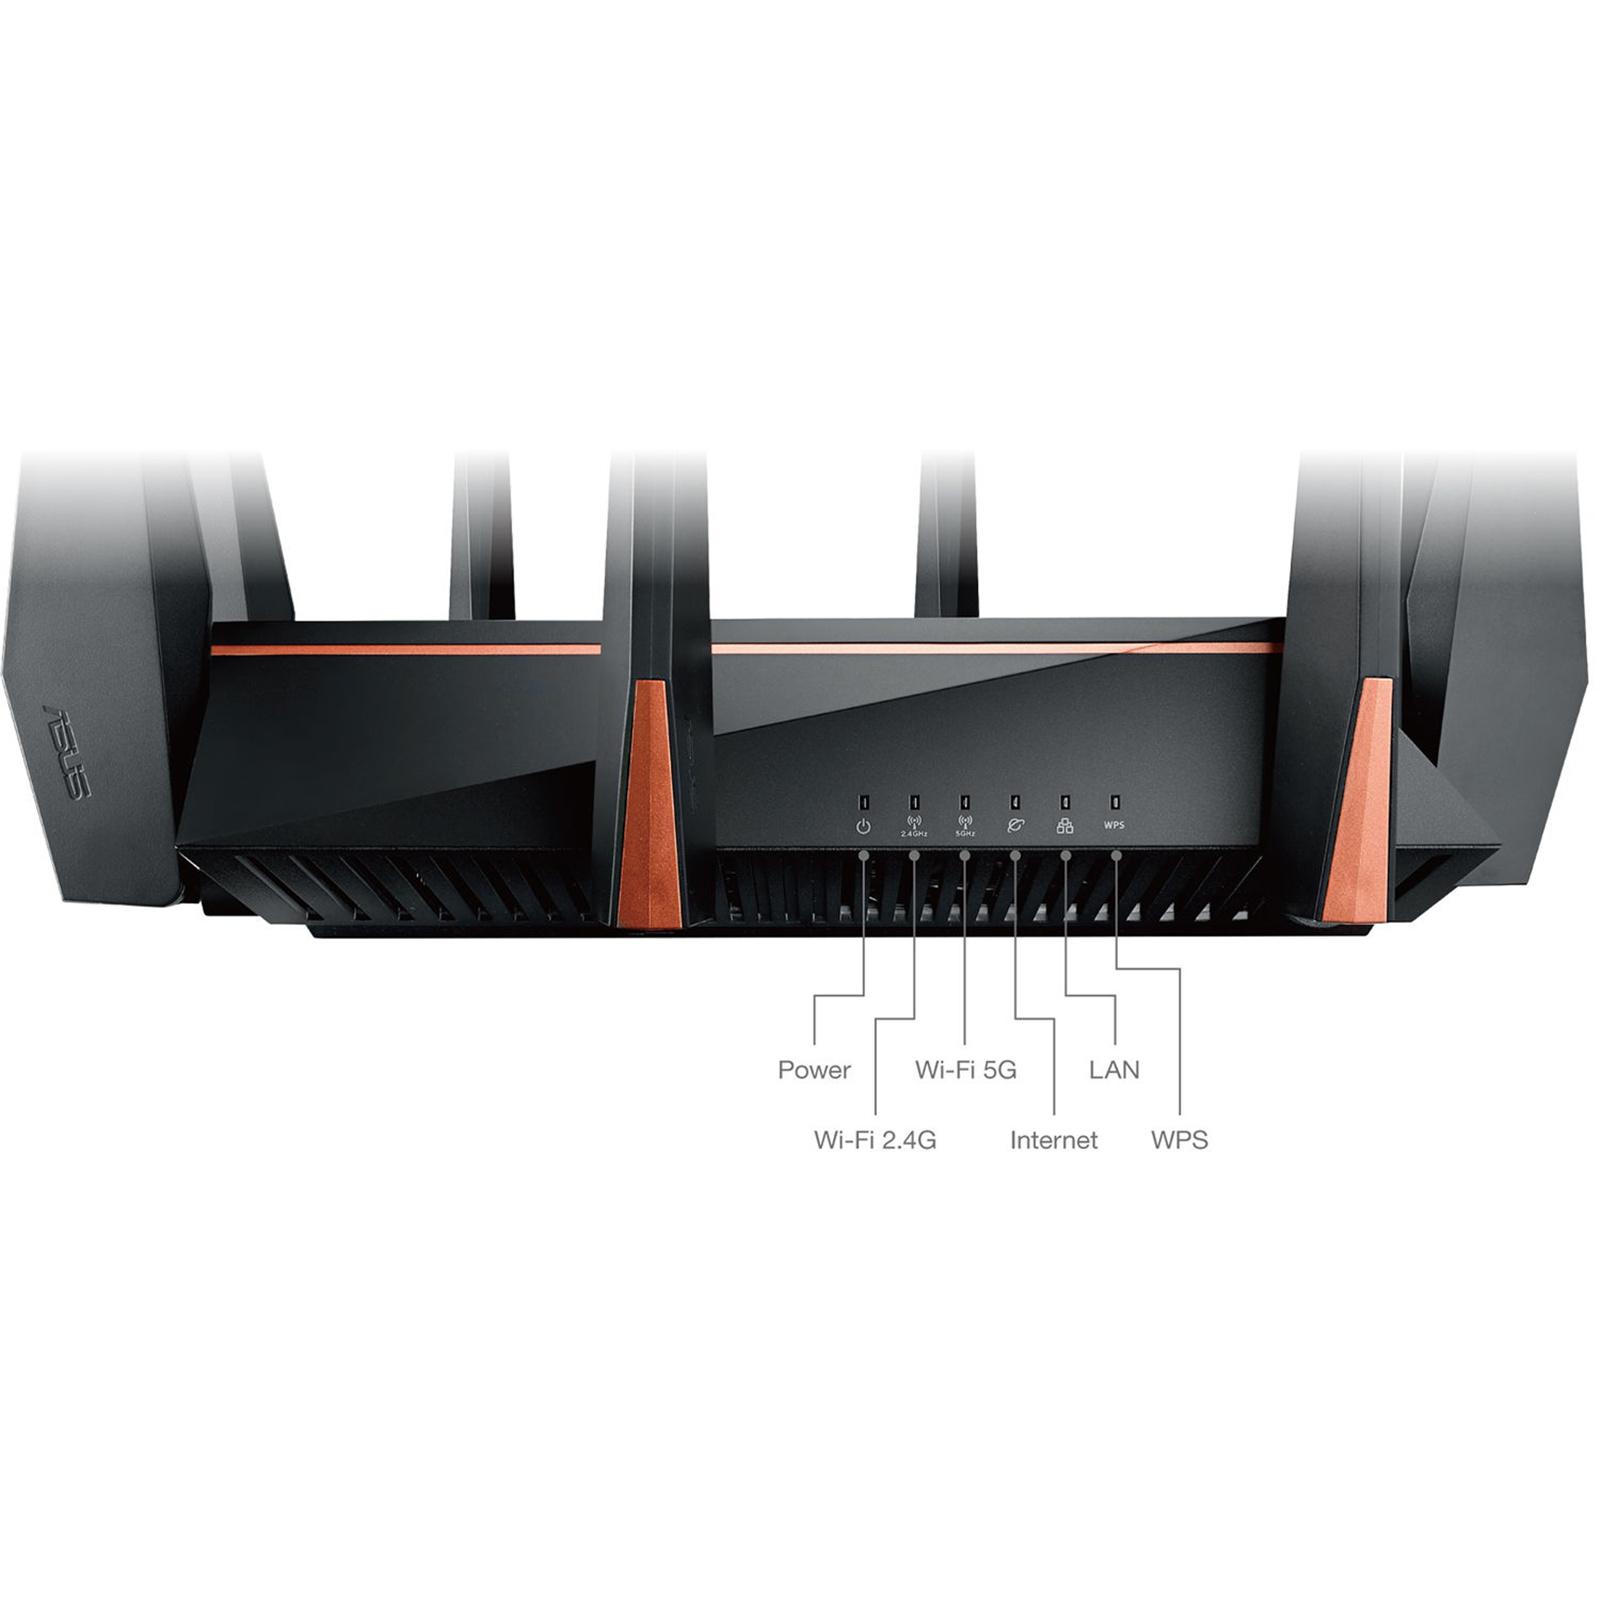 Buy the ASUS GT-AC5300 MU-MIMO Gigabit Wi-Fi Extreme Gaming